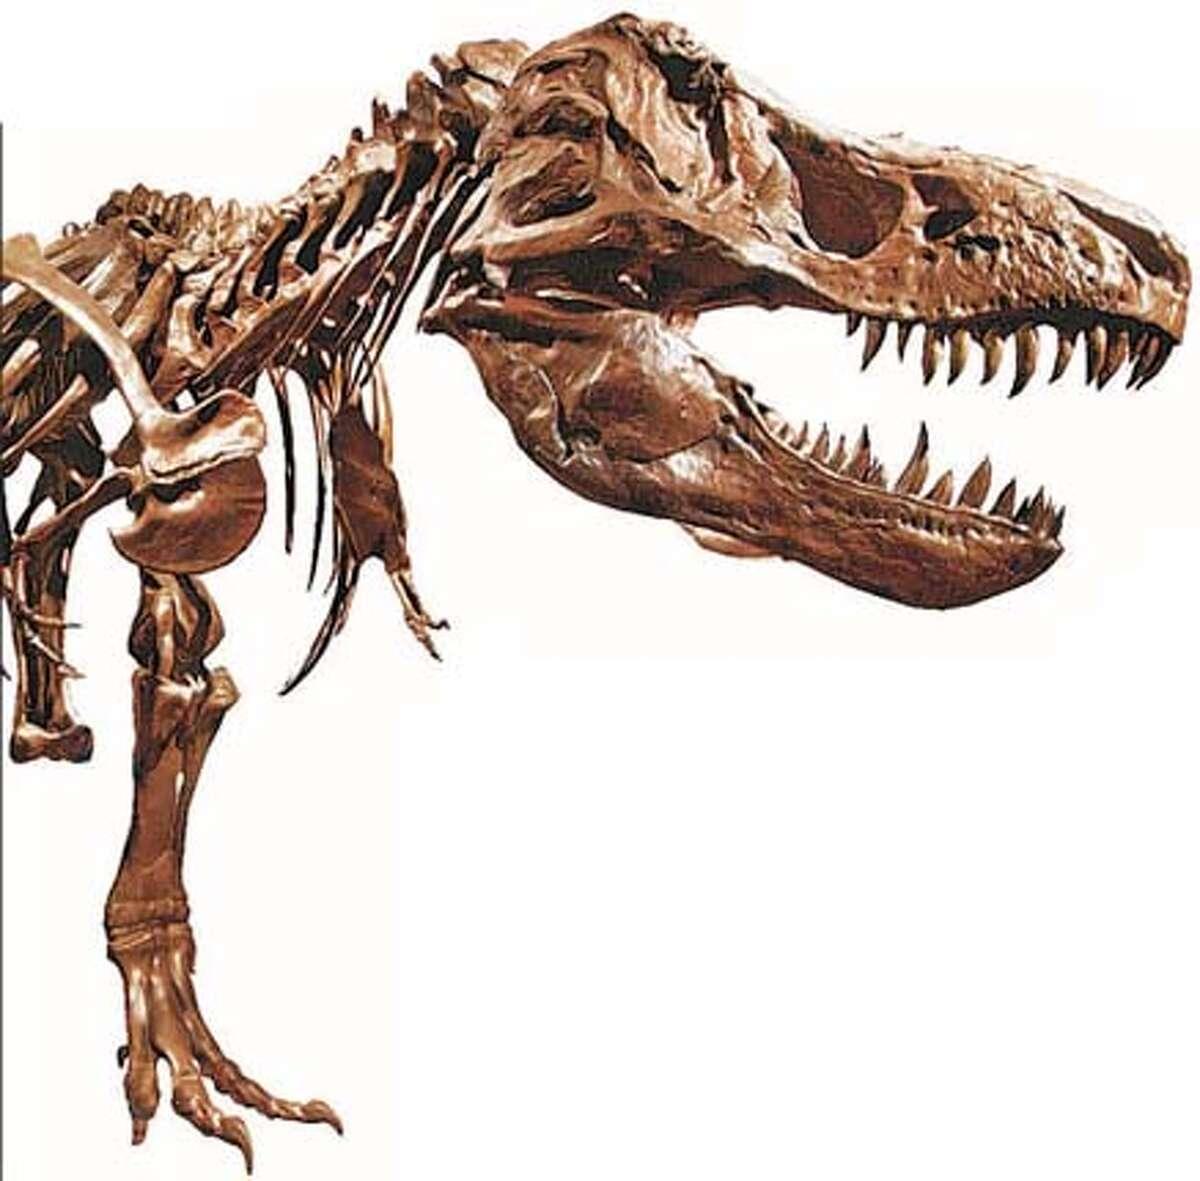 Dinosaurs on Display: